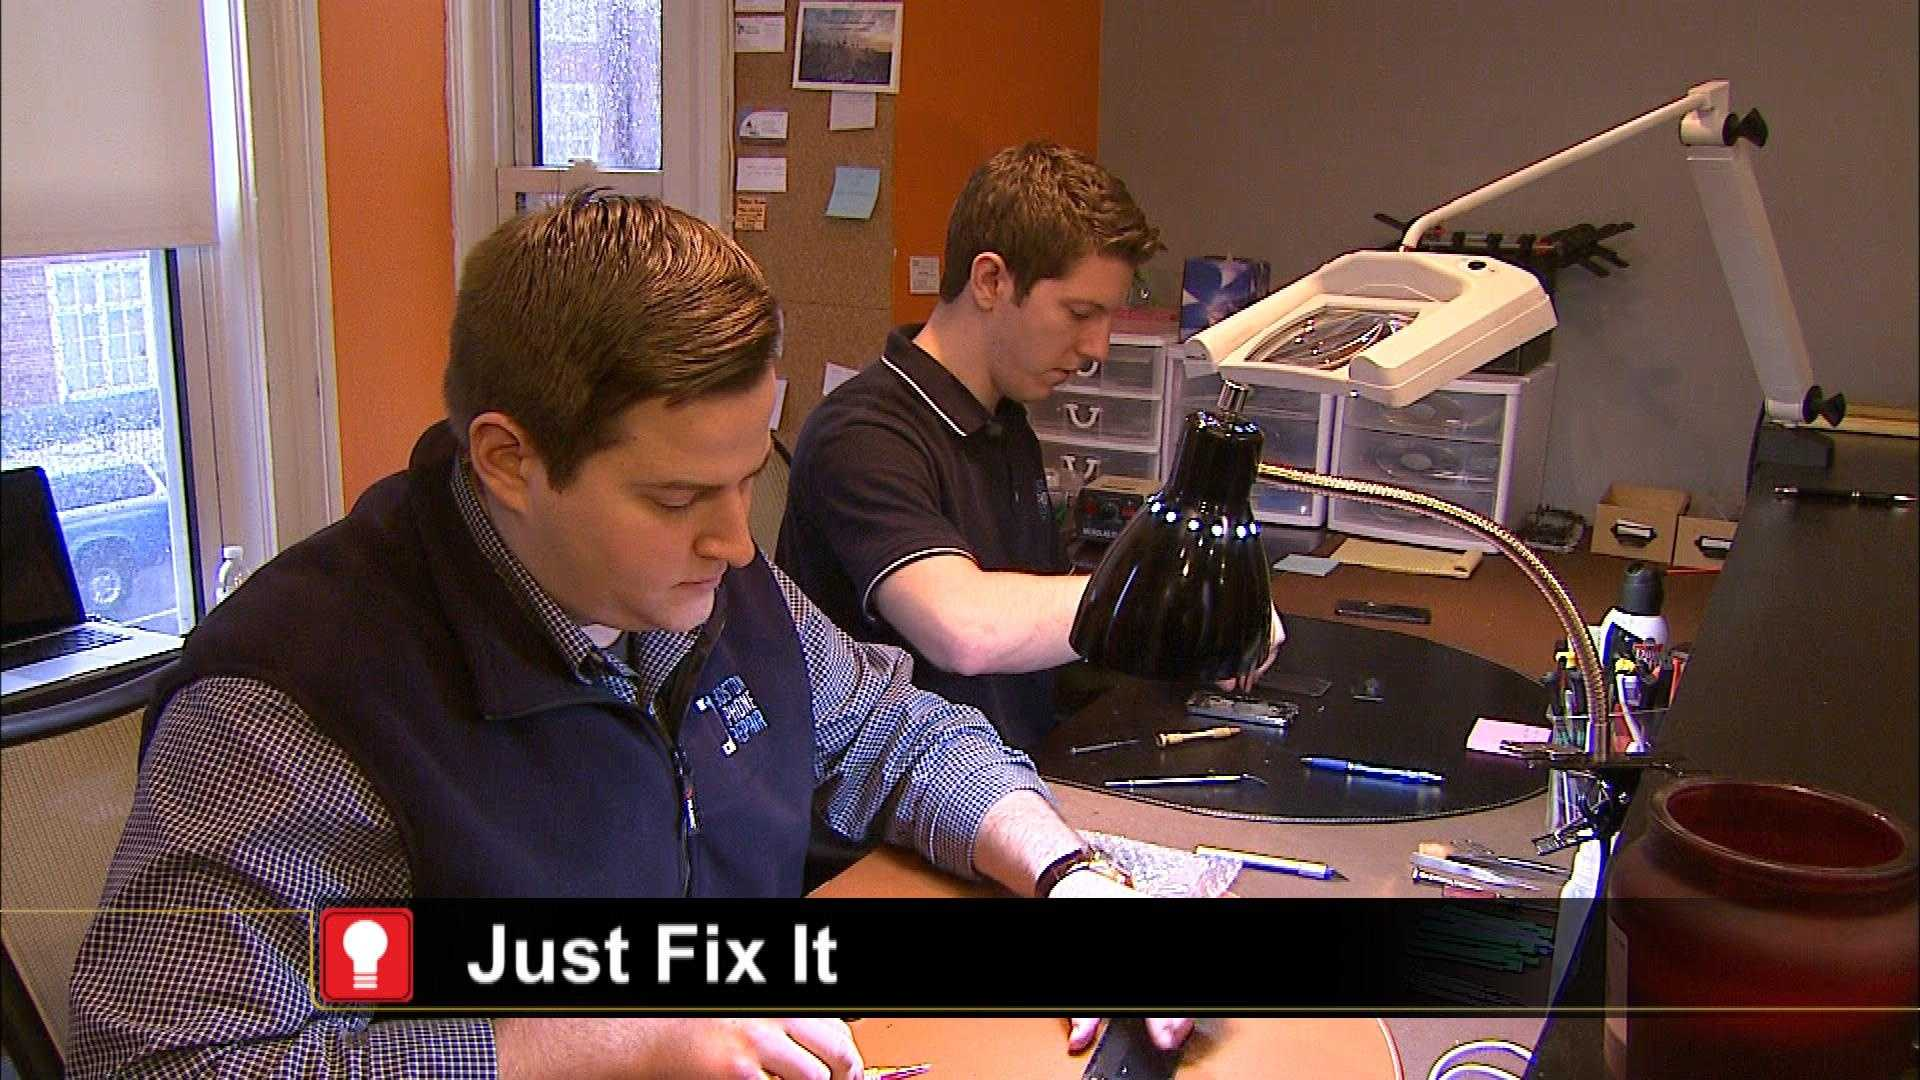 Image: Just Fix It